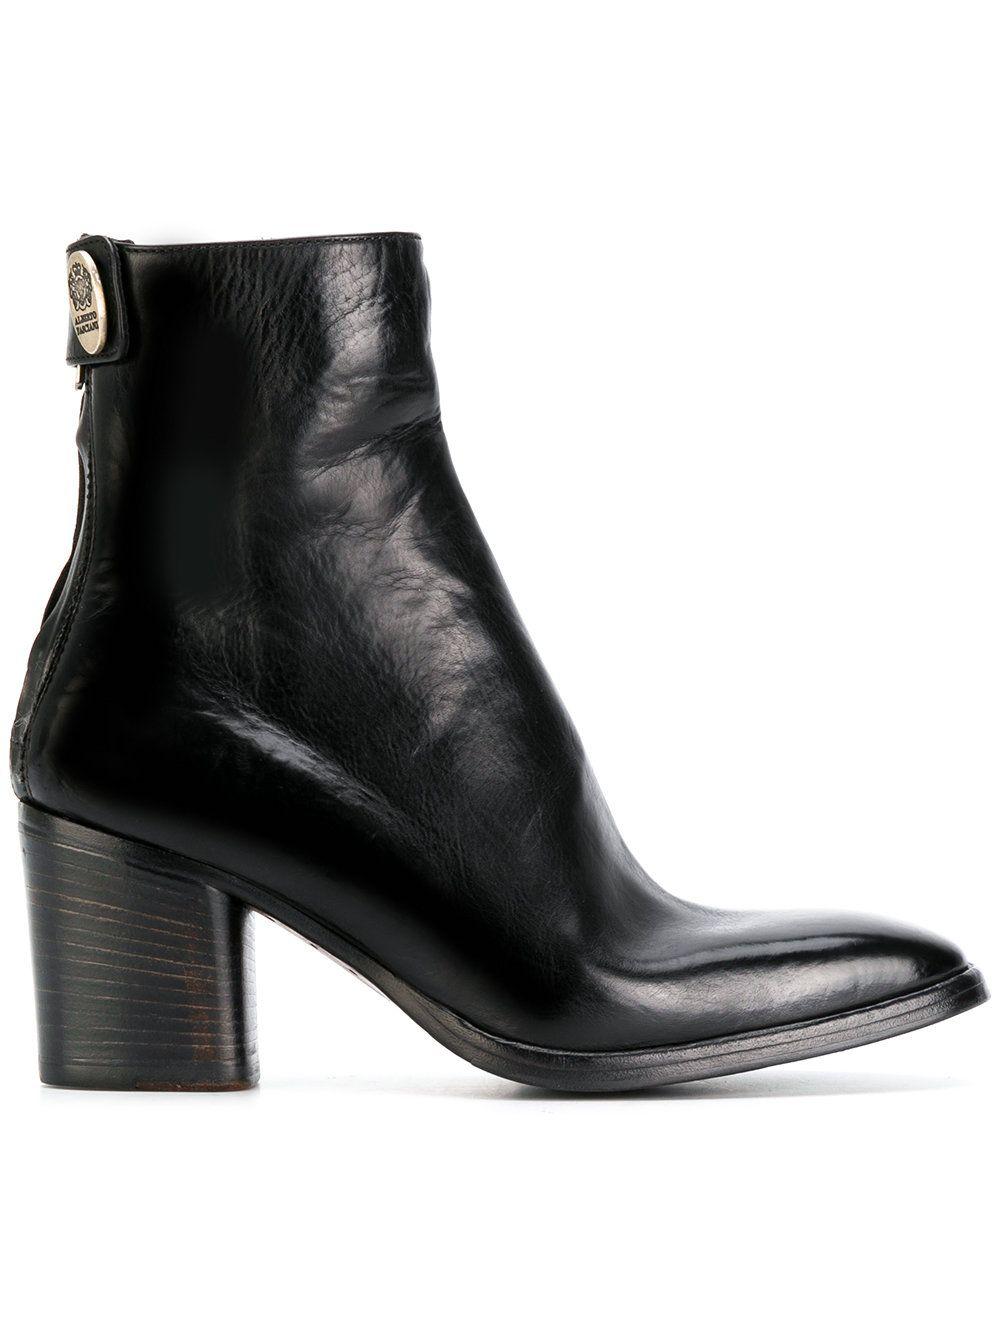 ALBERTO FASCIANI Mid heel ankle boots C4DF8Z